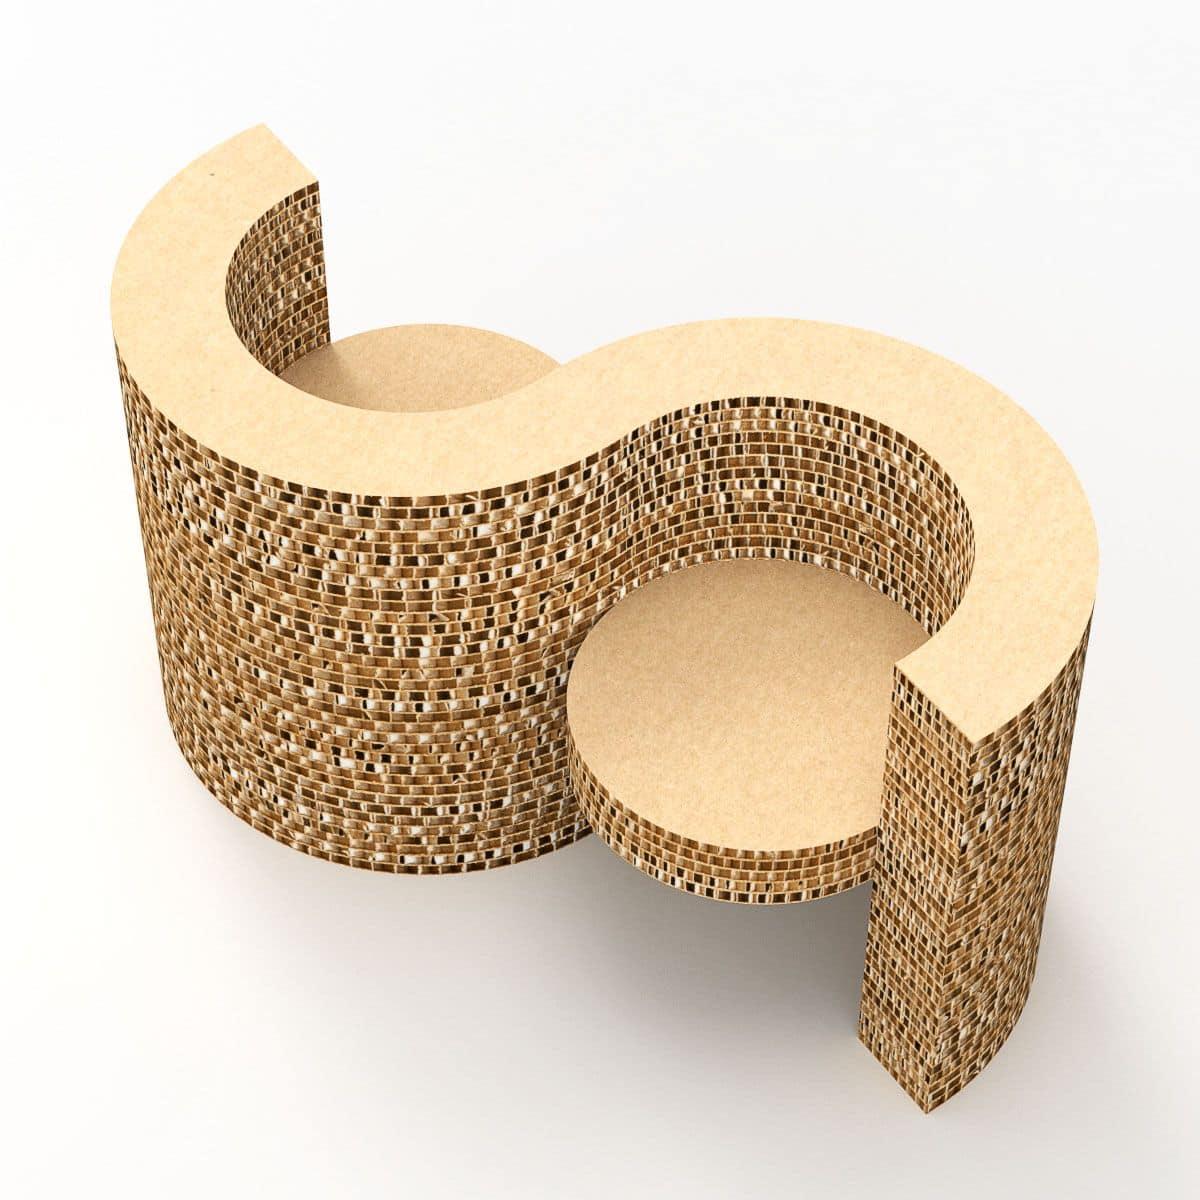 Sedie In Cartone Design.Elemento Con Due Sedute Con Braccioli In Cartone Idfdesign